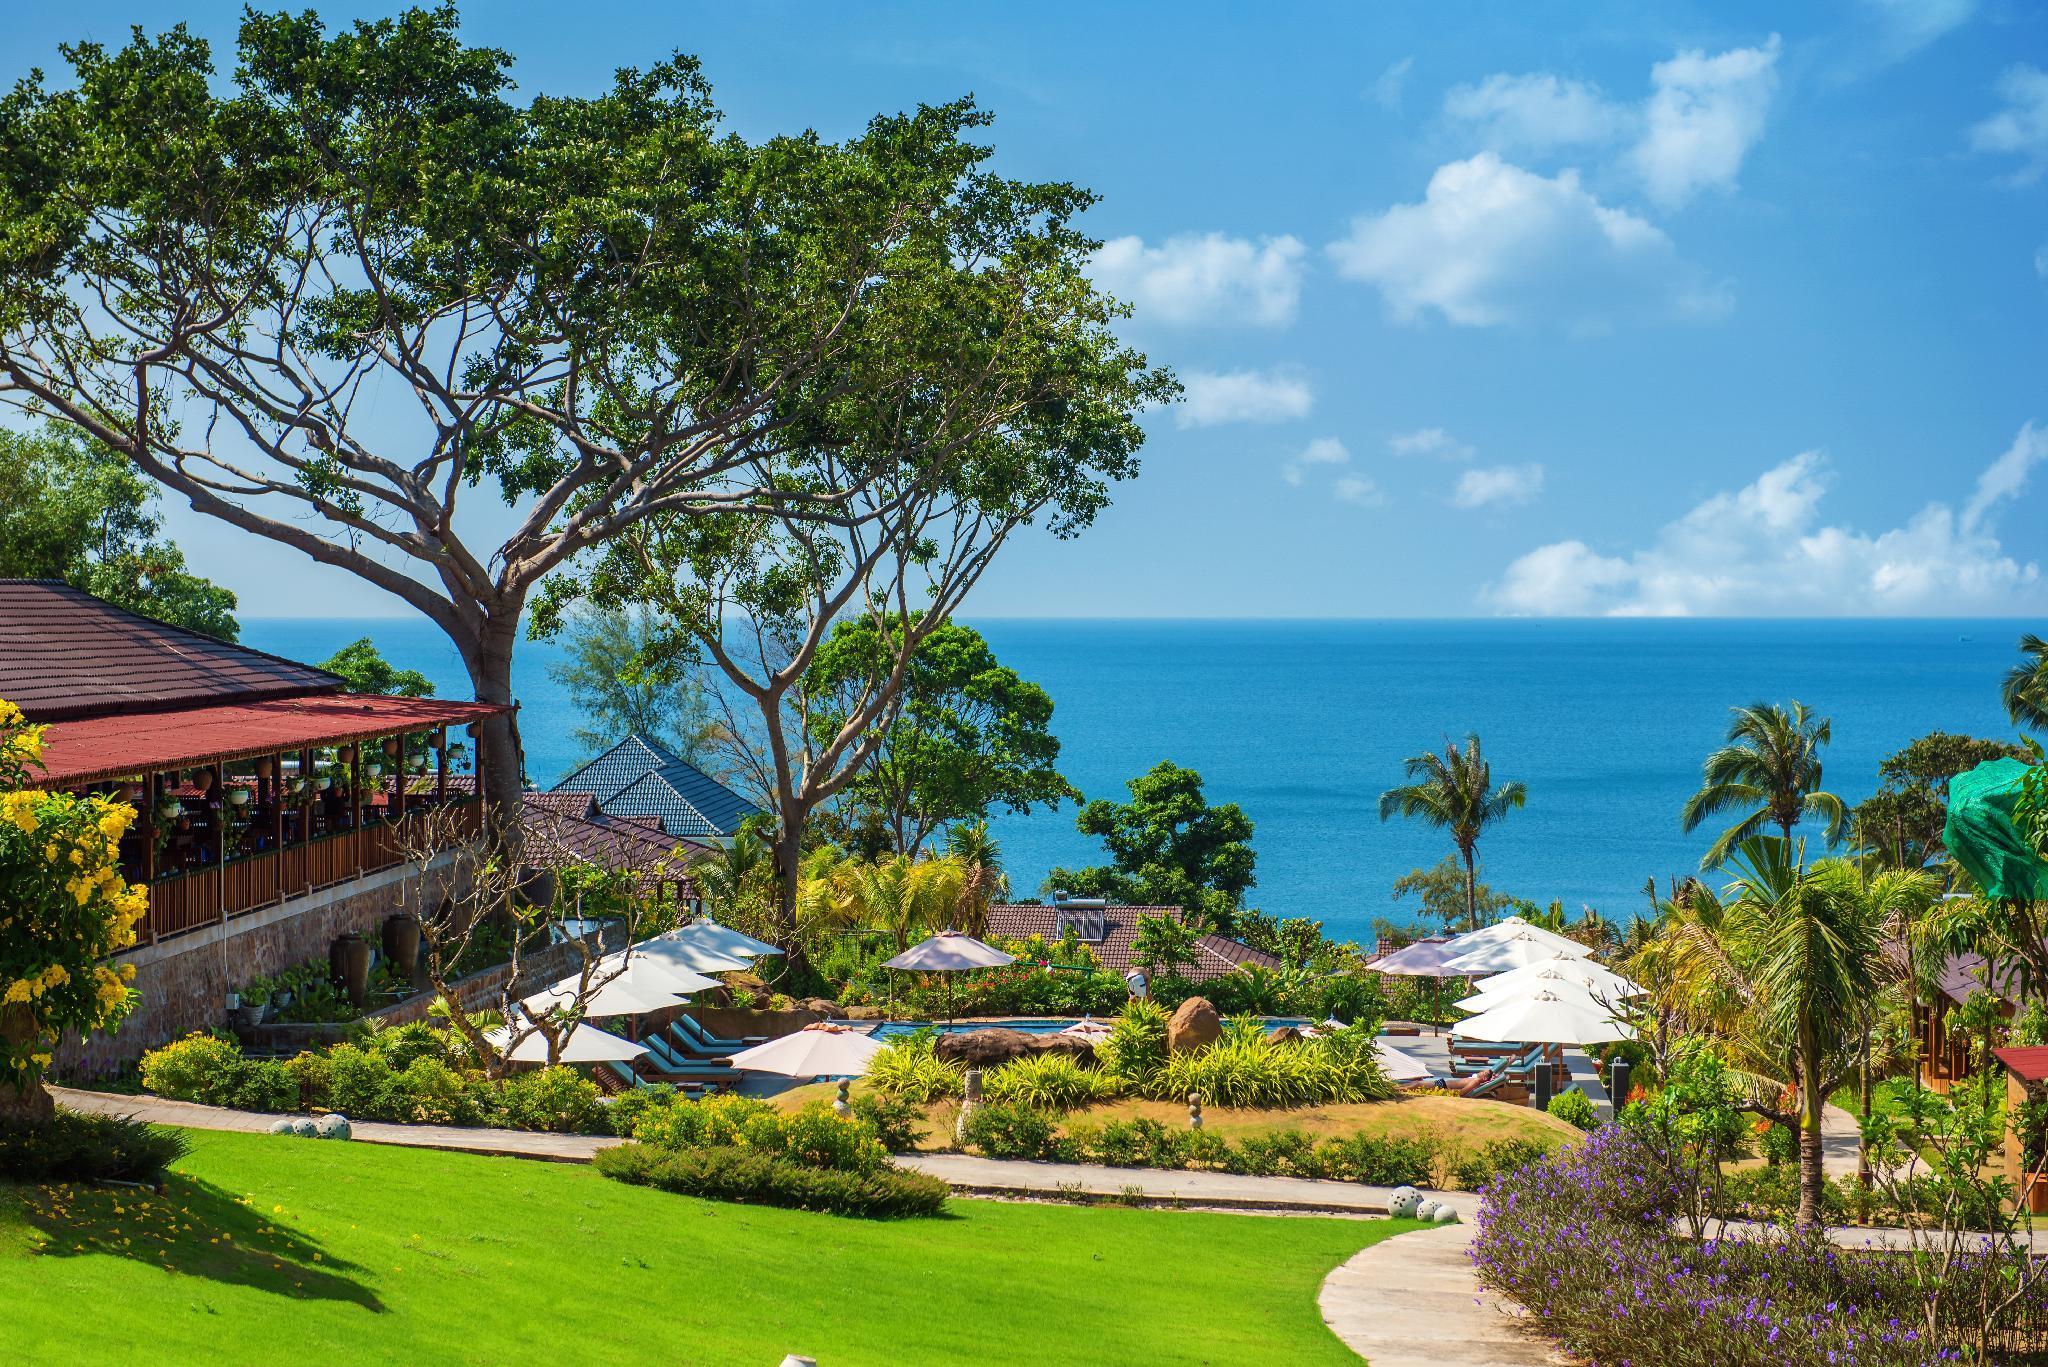 Camia Resort And Spa